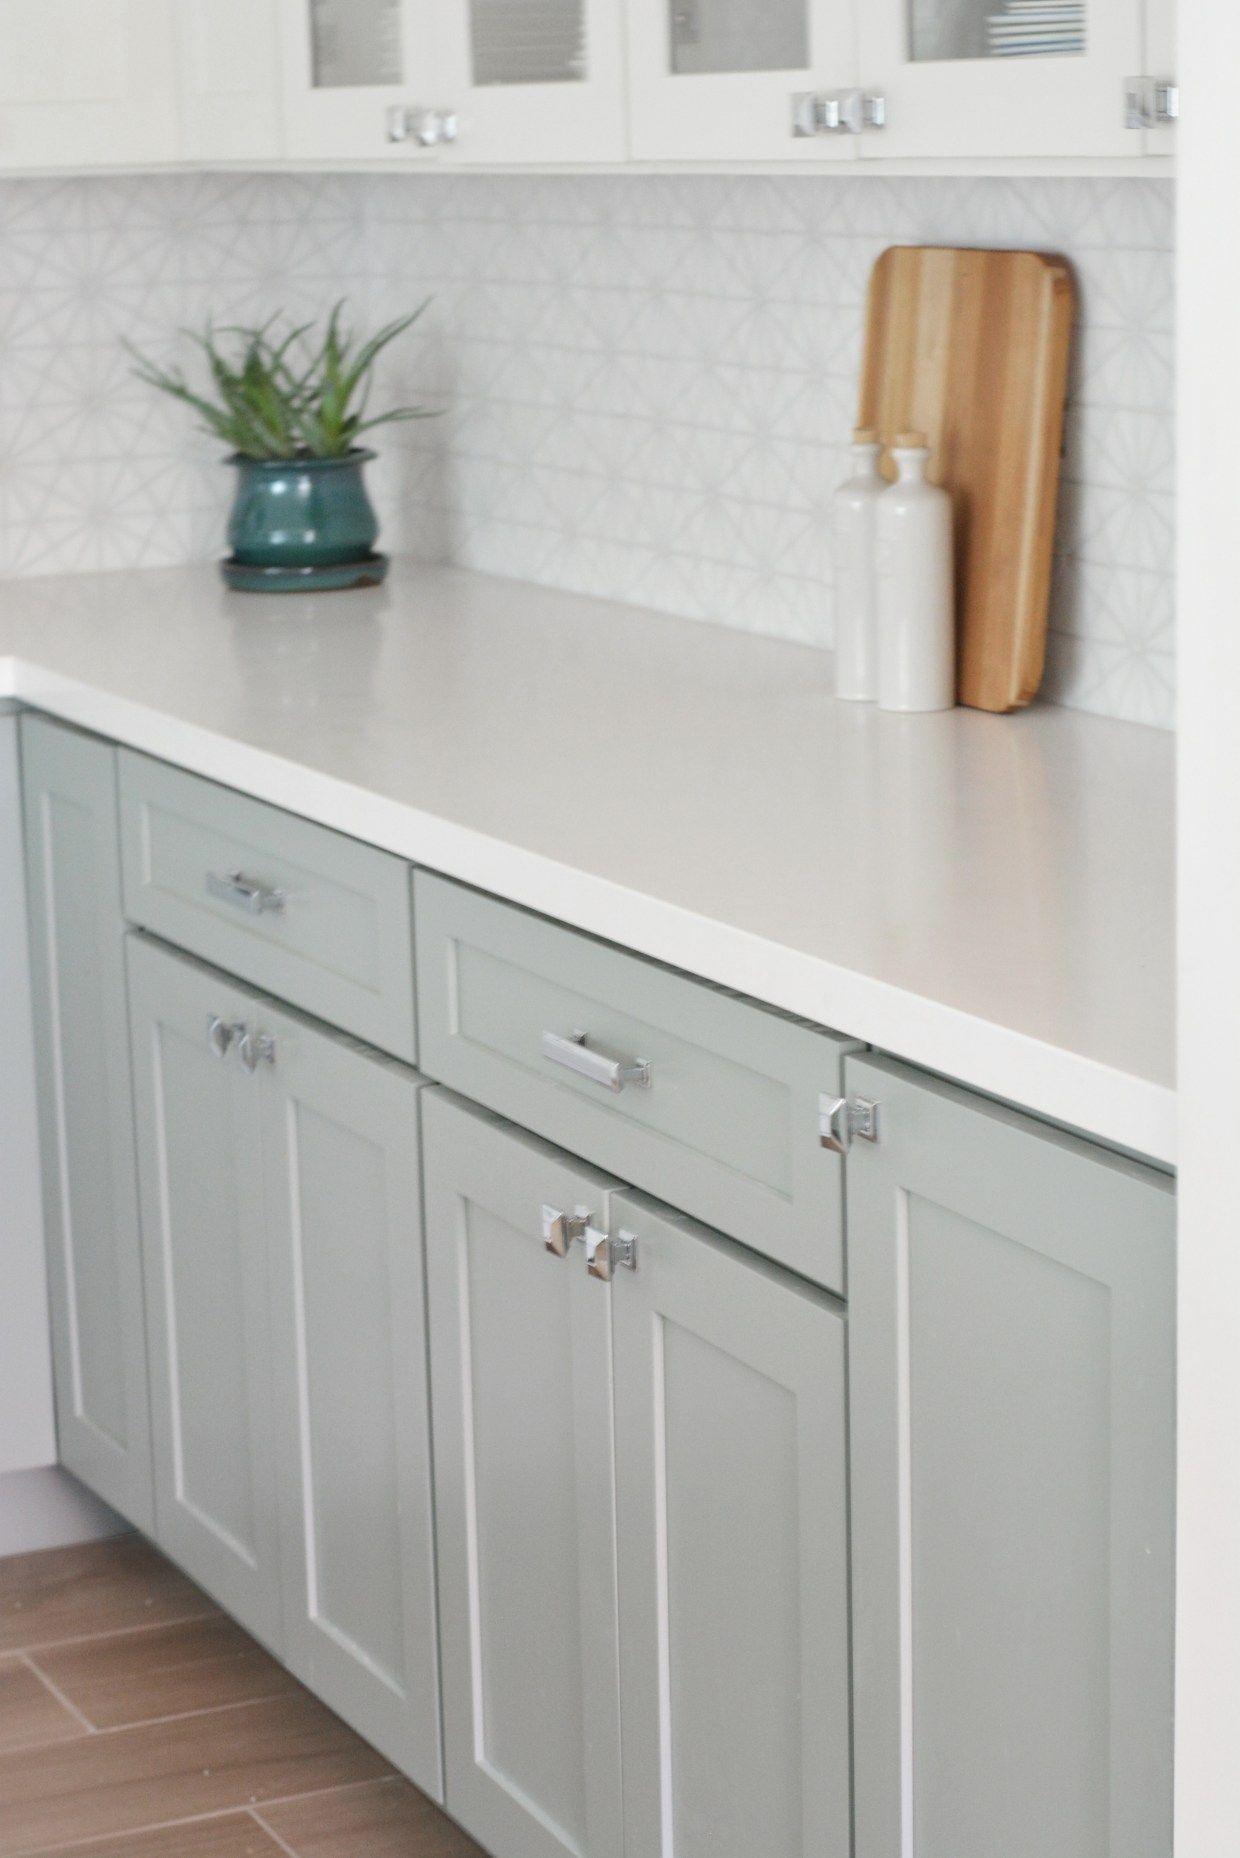 caesarstone pure white quartz countertops #purewhite